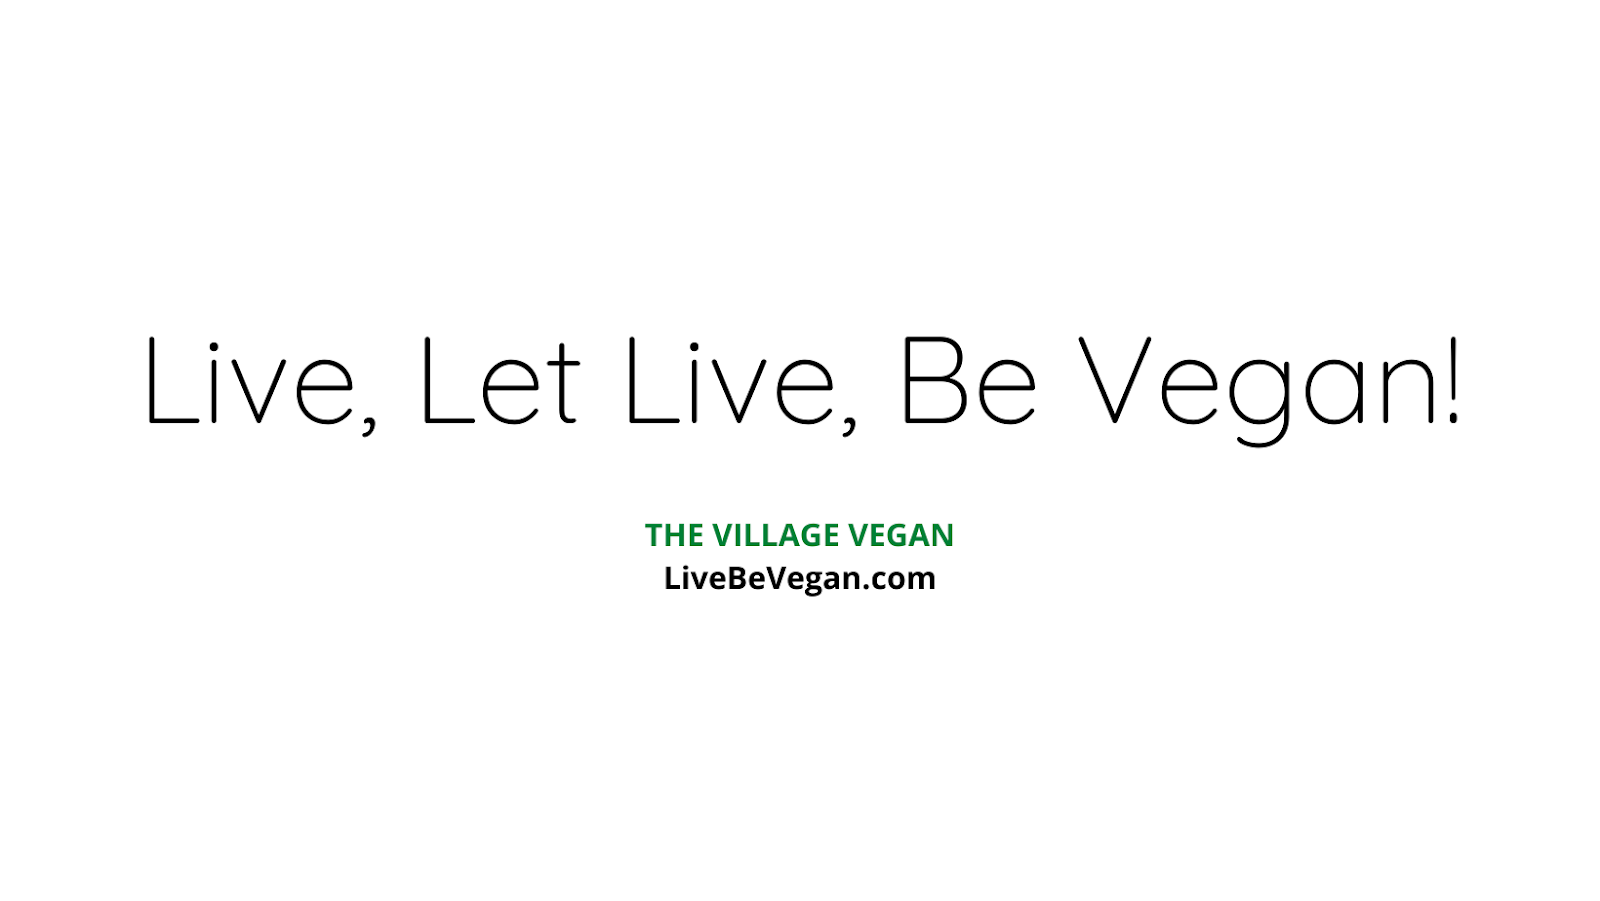 THE VILLAGE VEGAN: Live, Let Live Be Vegan!